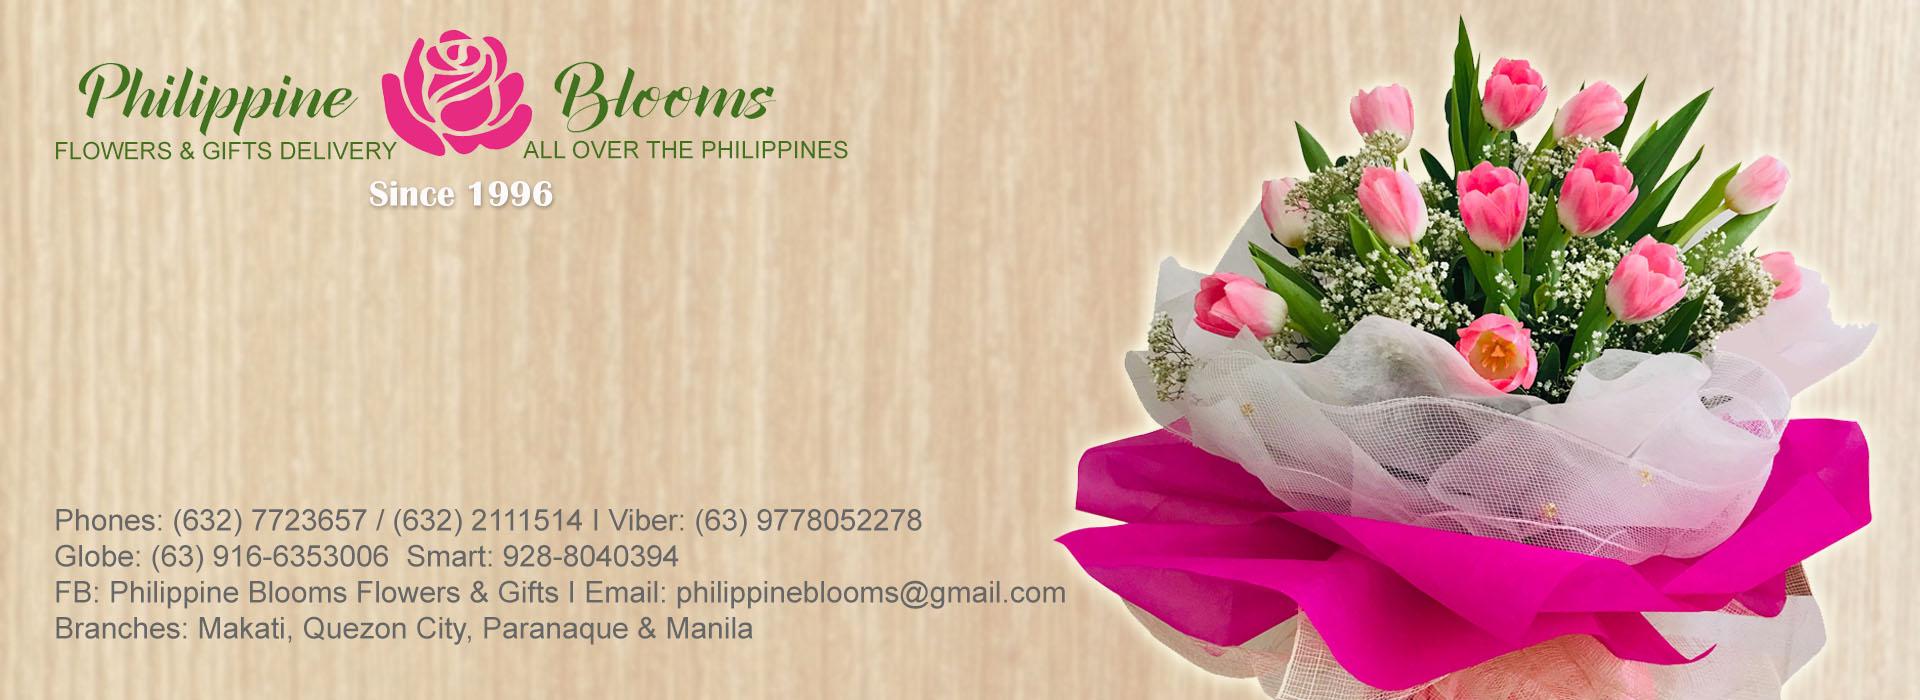 Philippine Blooms